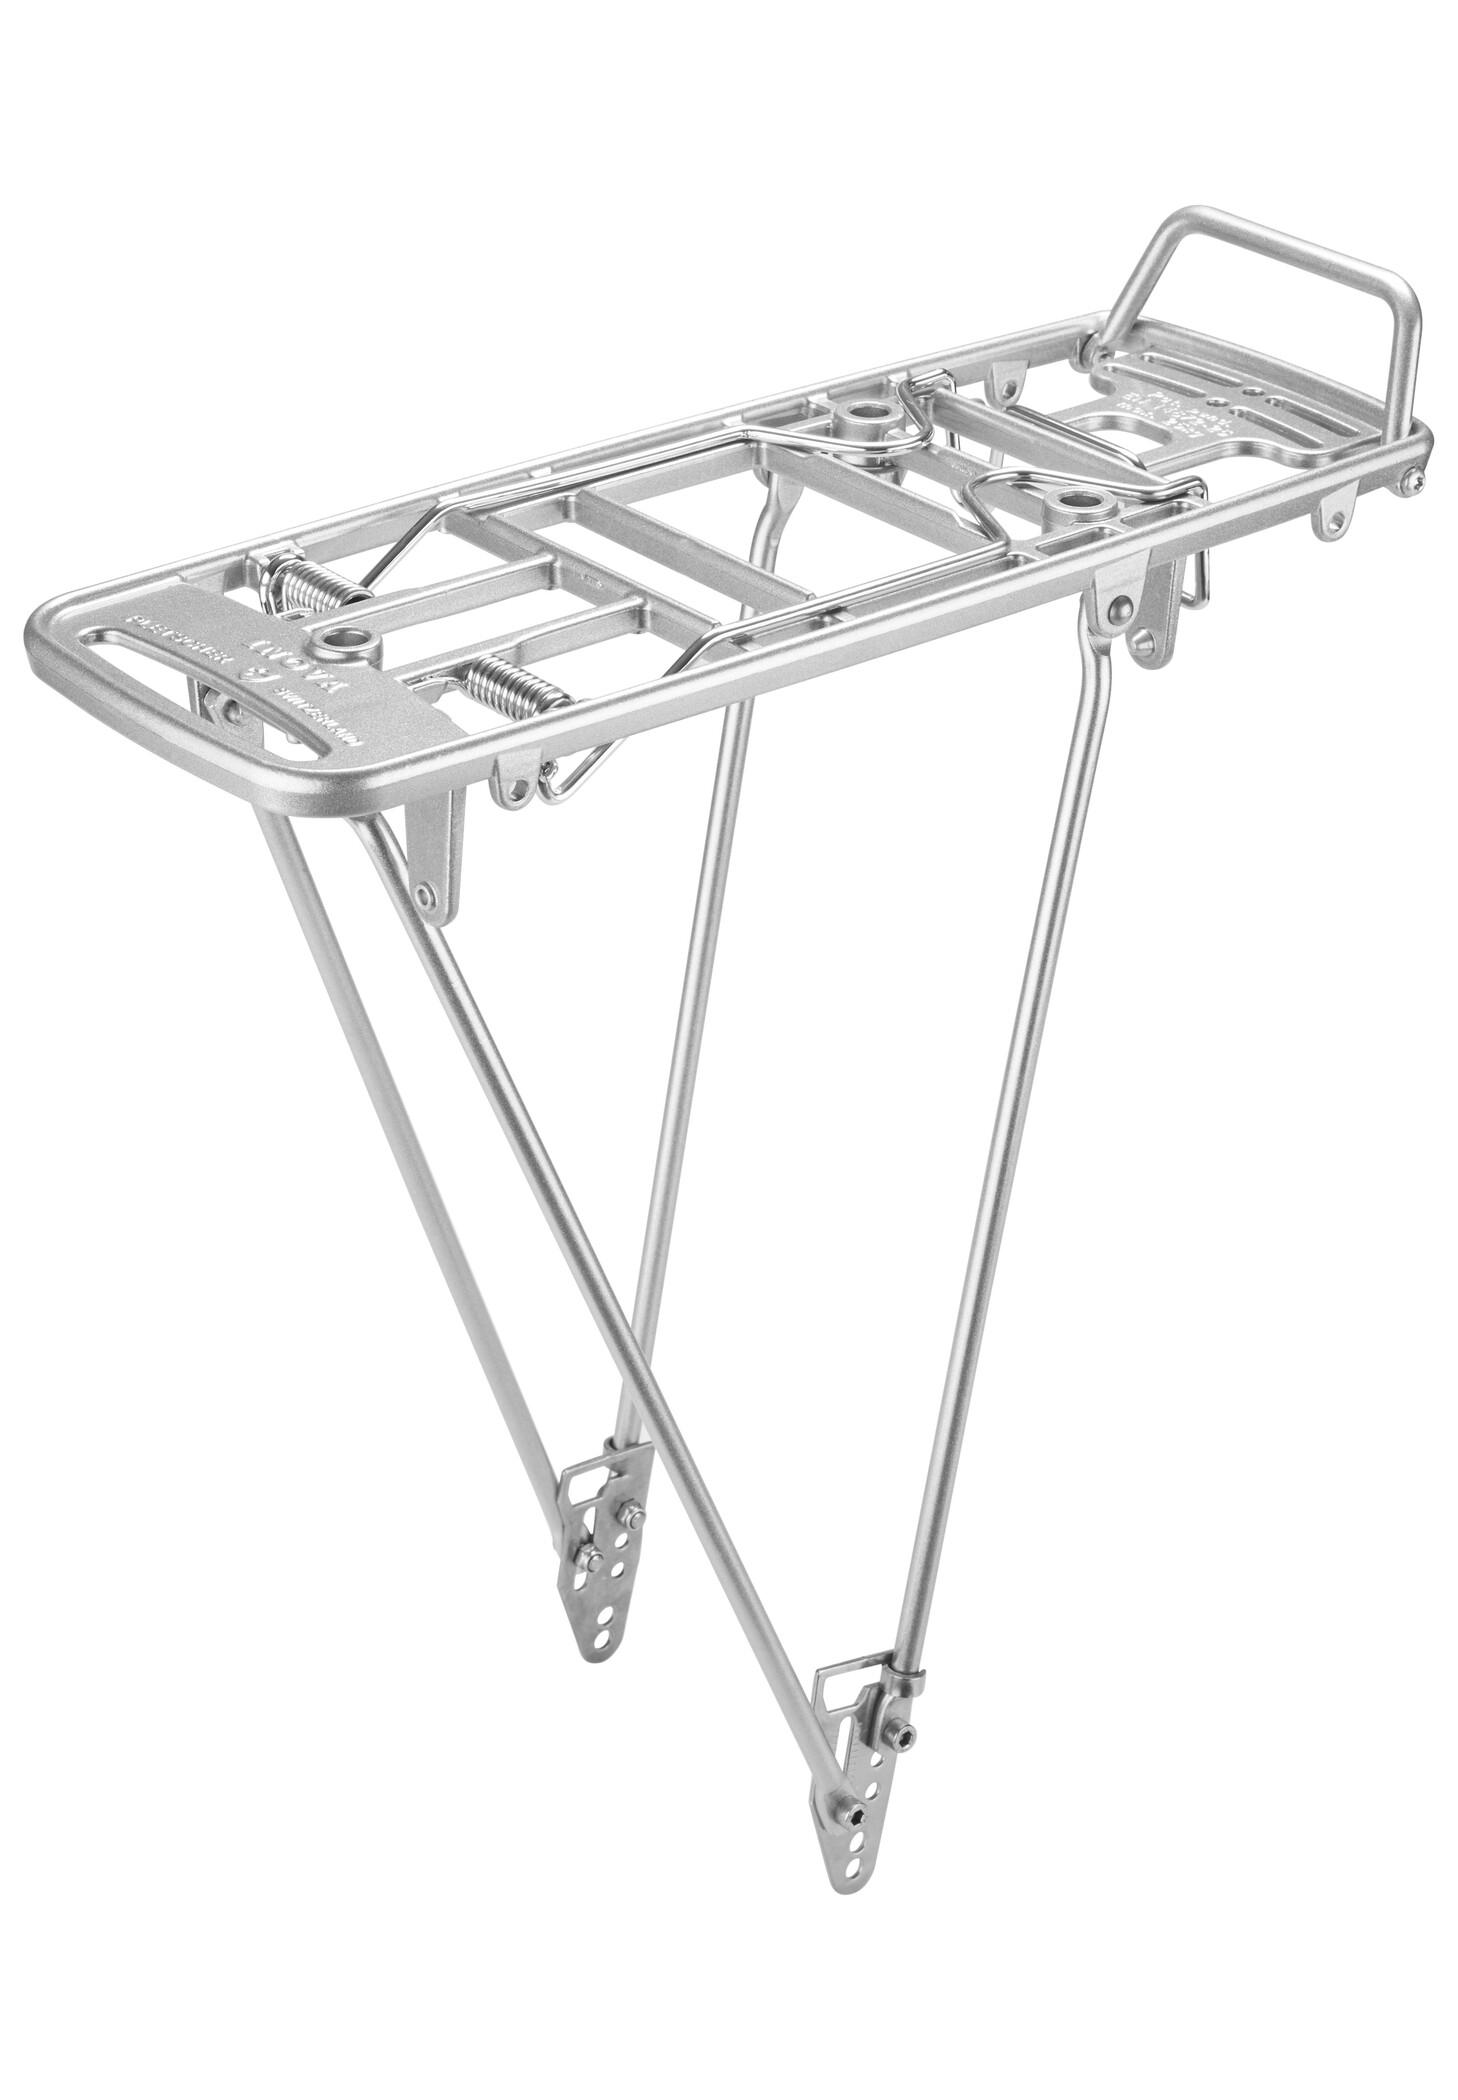 "Pletscher Inova Rack 26-28"" Easyfix, silver (2019) | Baglygter"